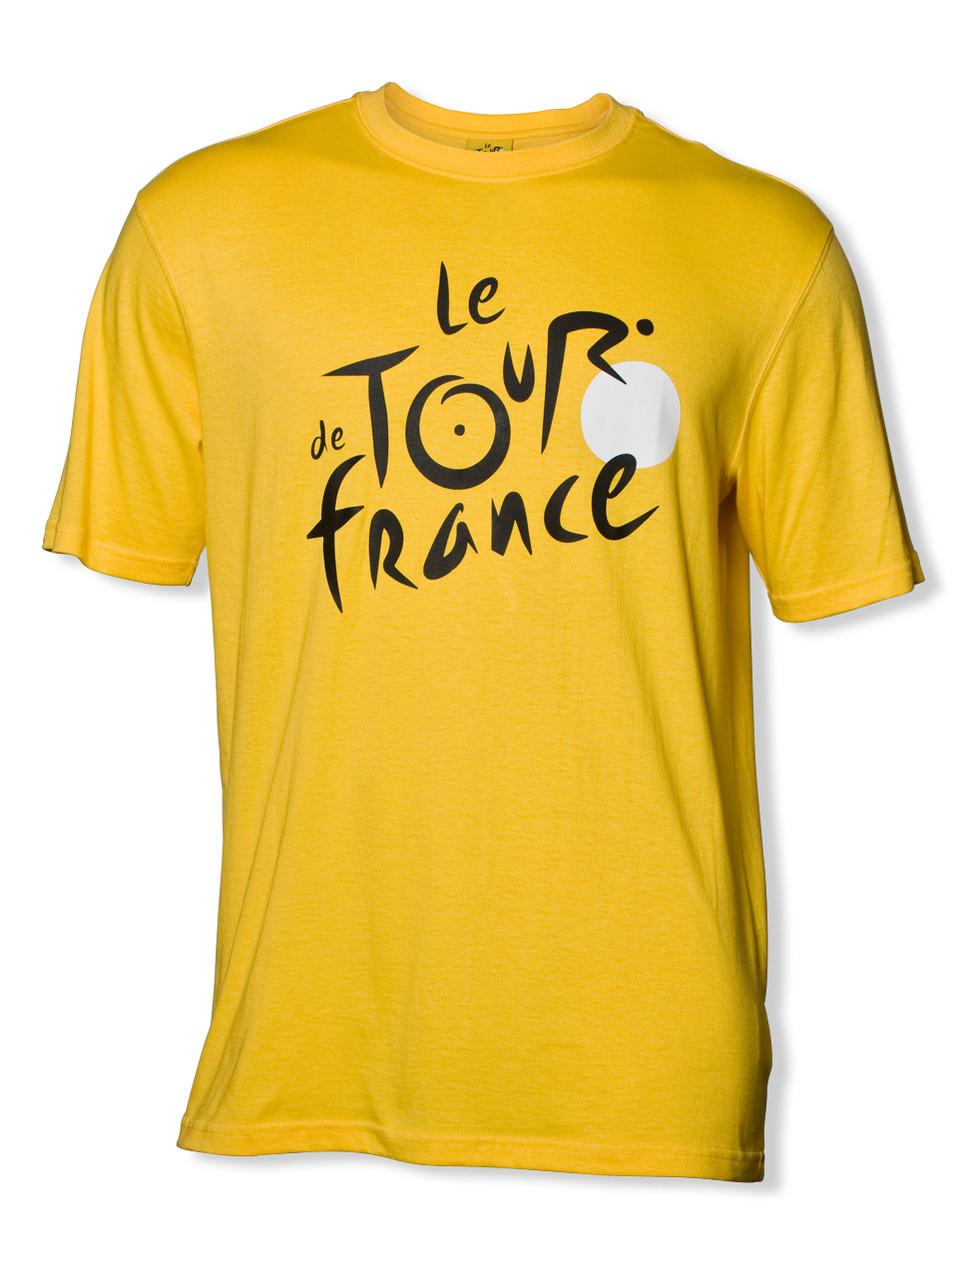 Le Tour De France Logo T Shirt In Yellow Adult Sizes Peak Cycle Wear